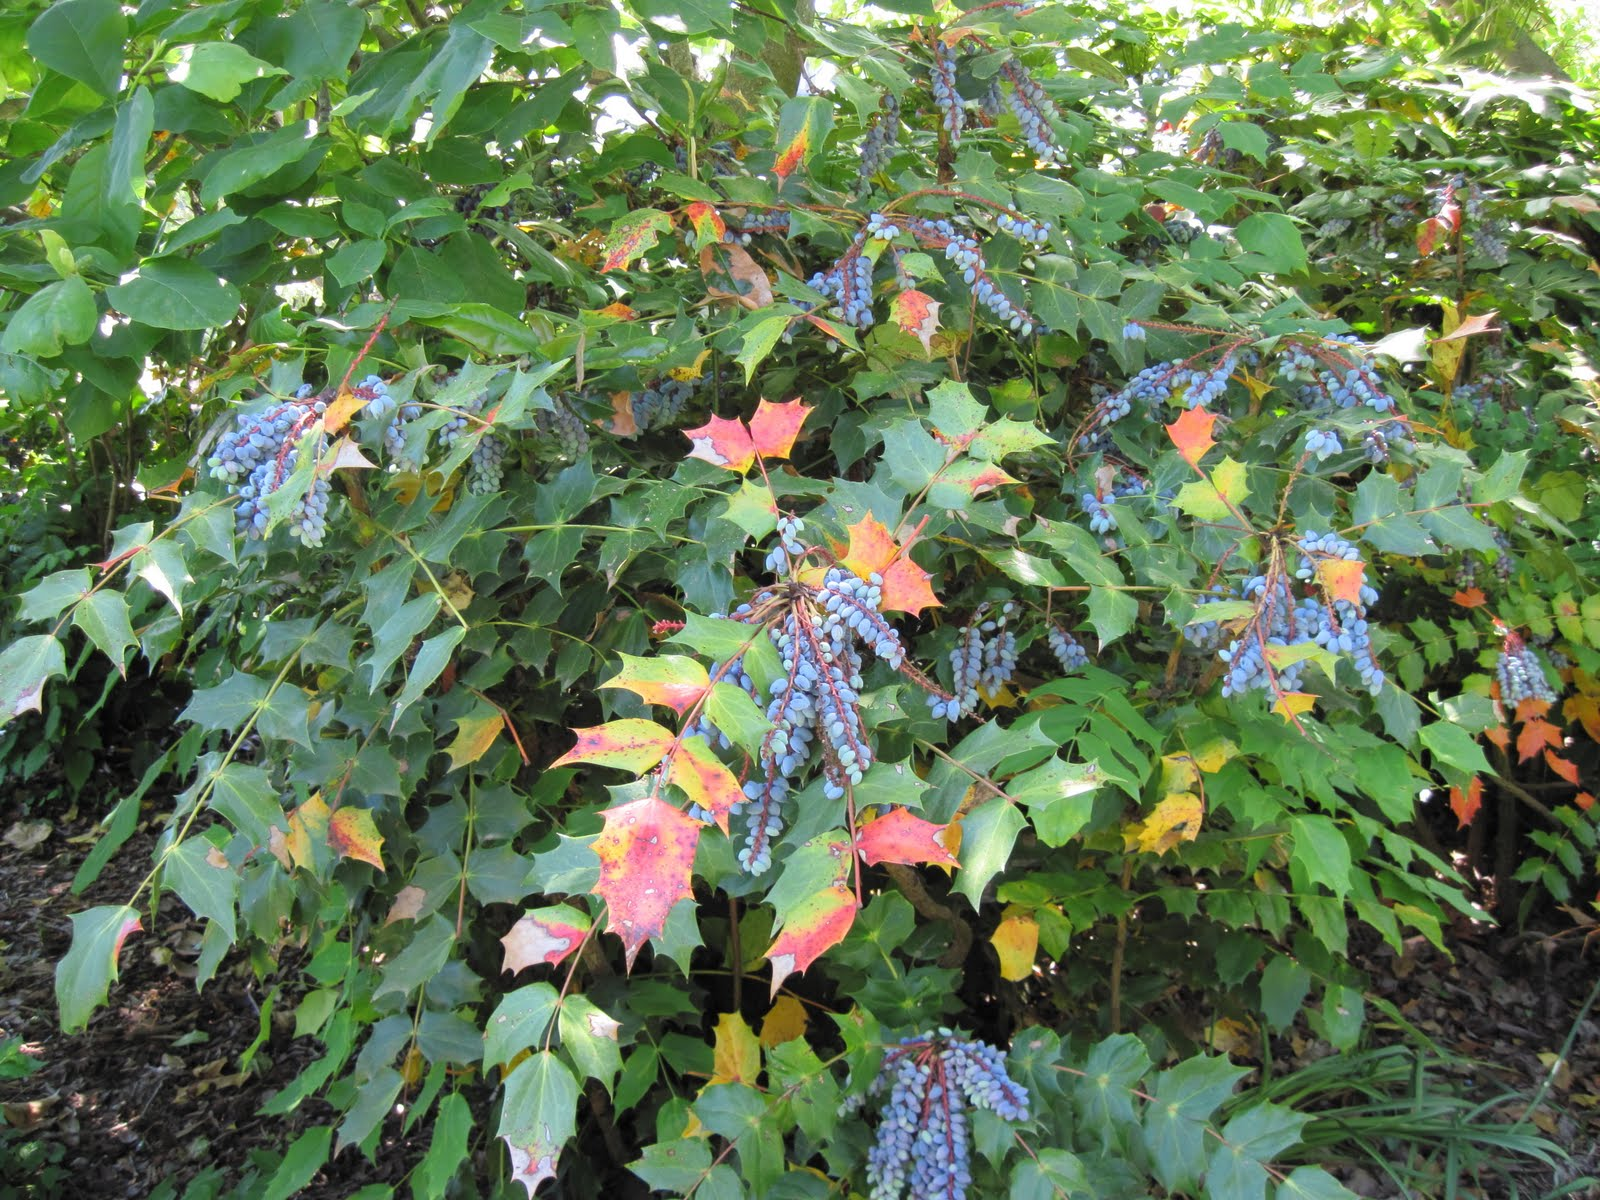 Central Virginia Organic Gardener: Rethinking mahonia? Maybeeee